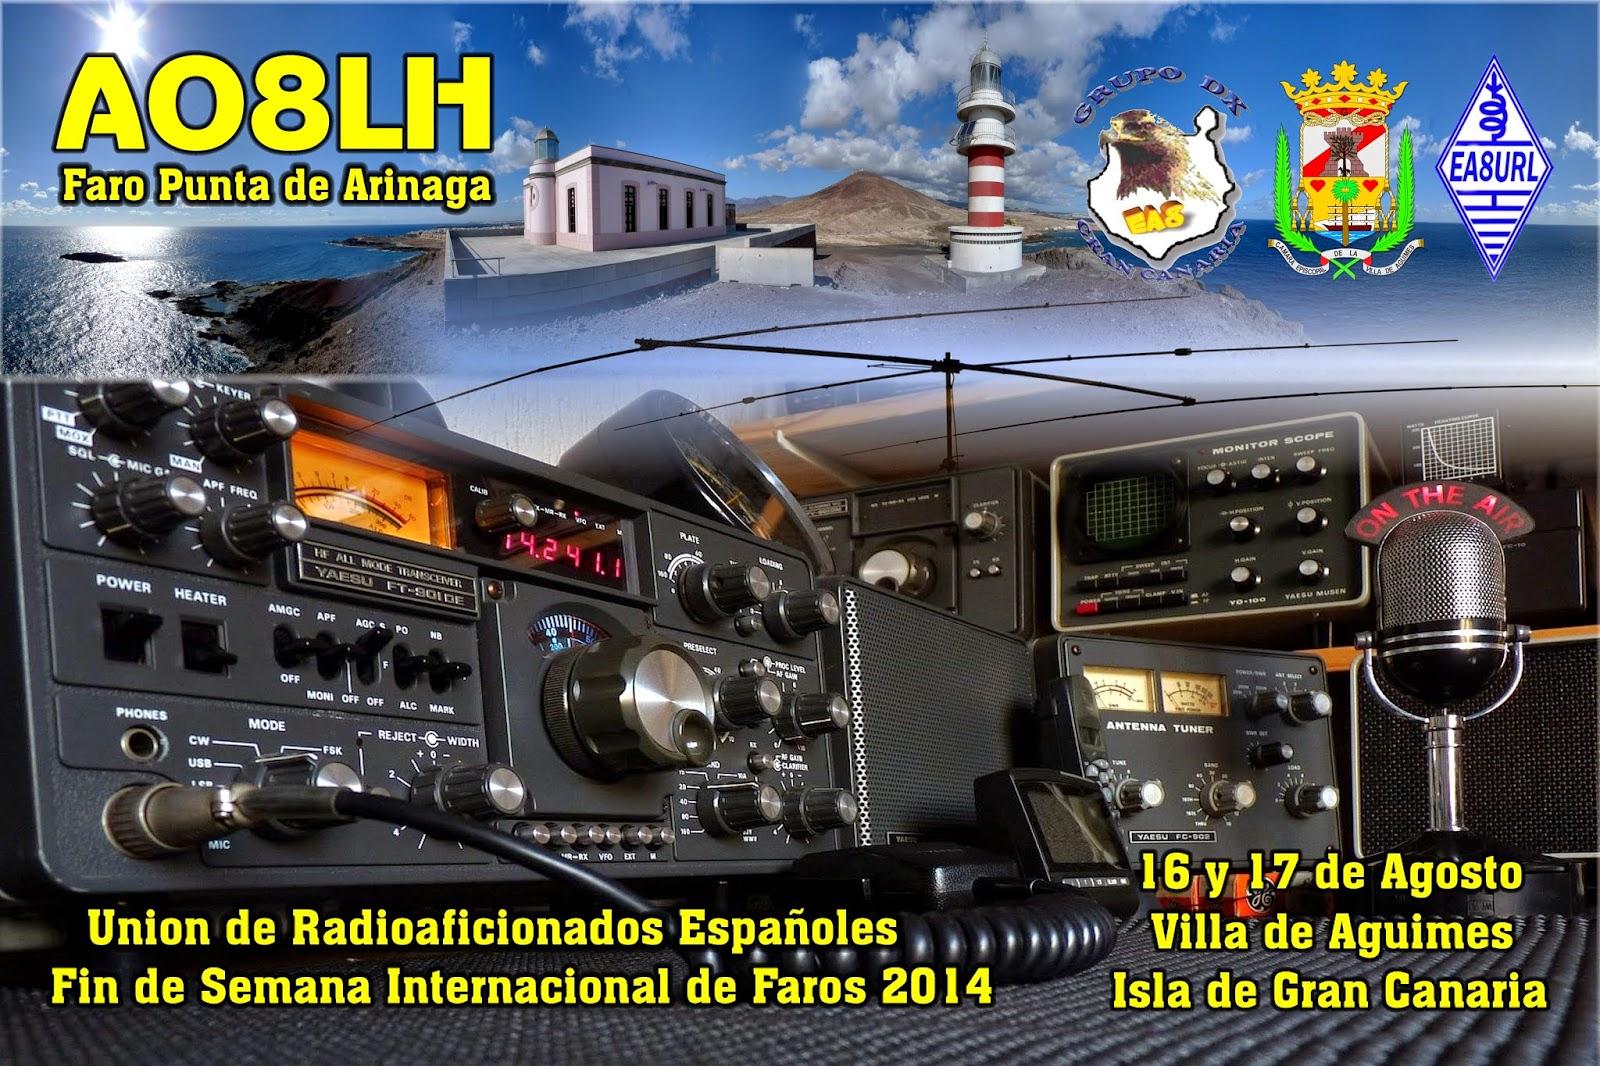 AO8LH - Faro de Aringa